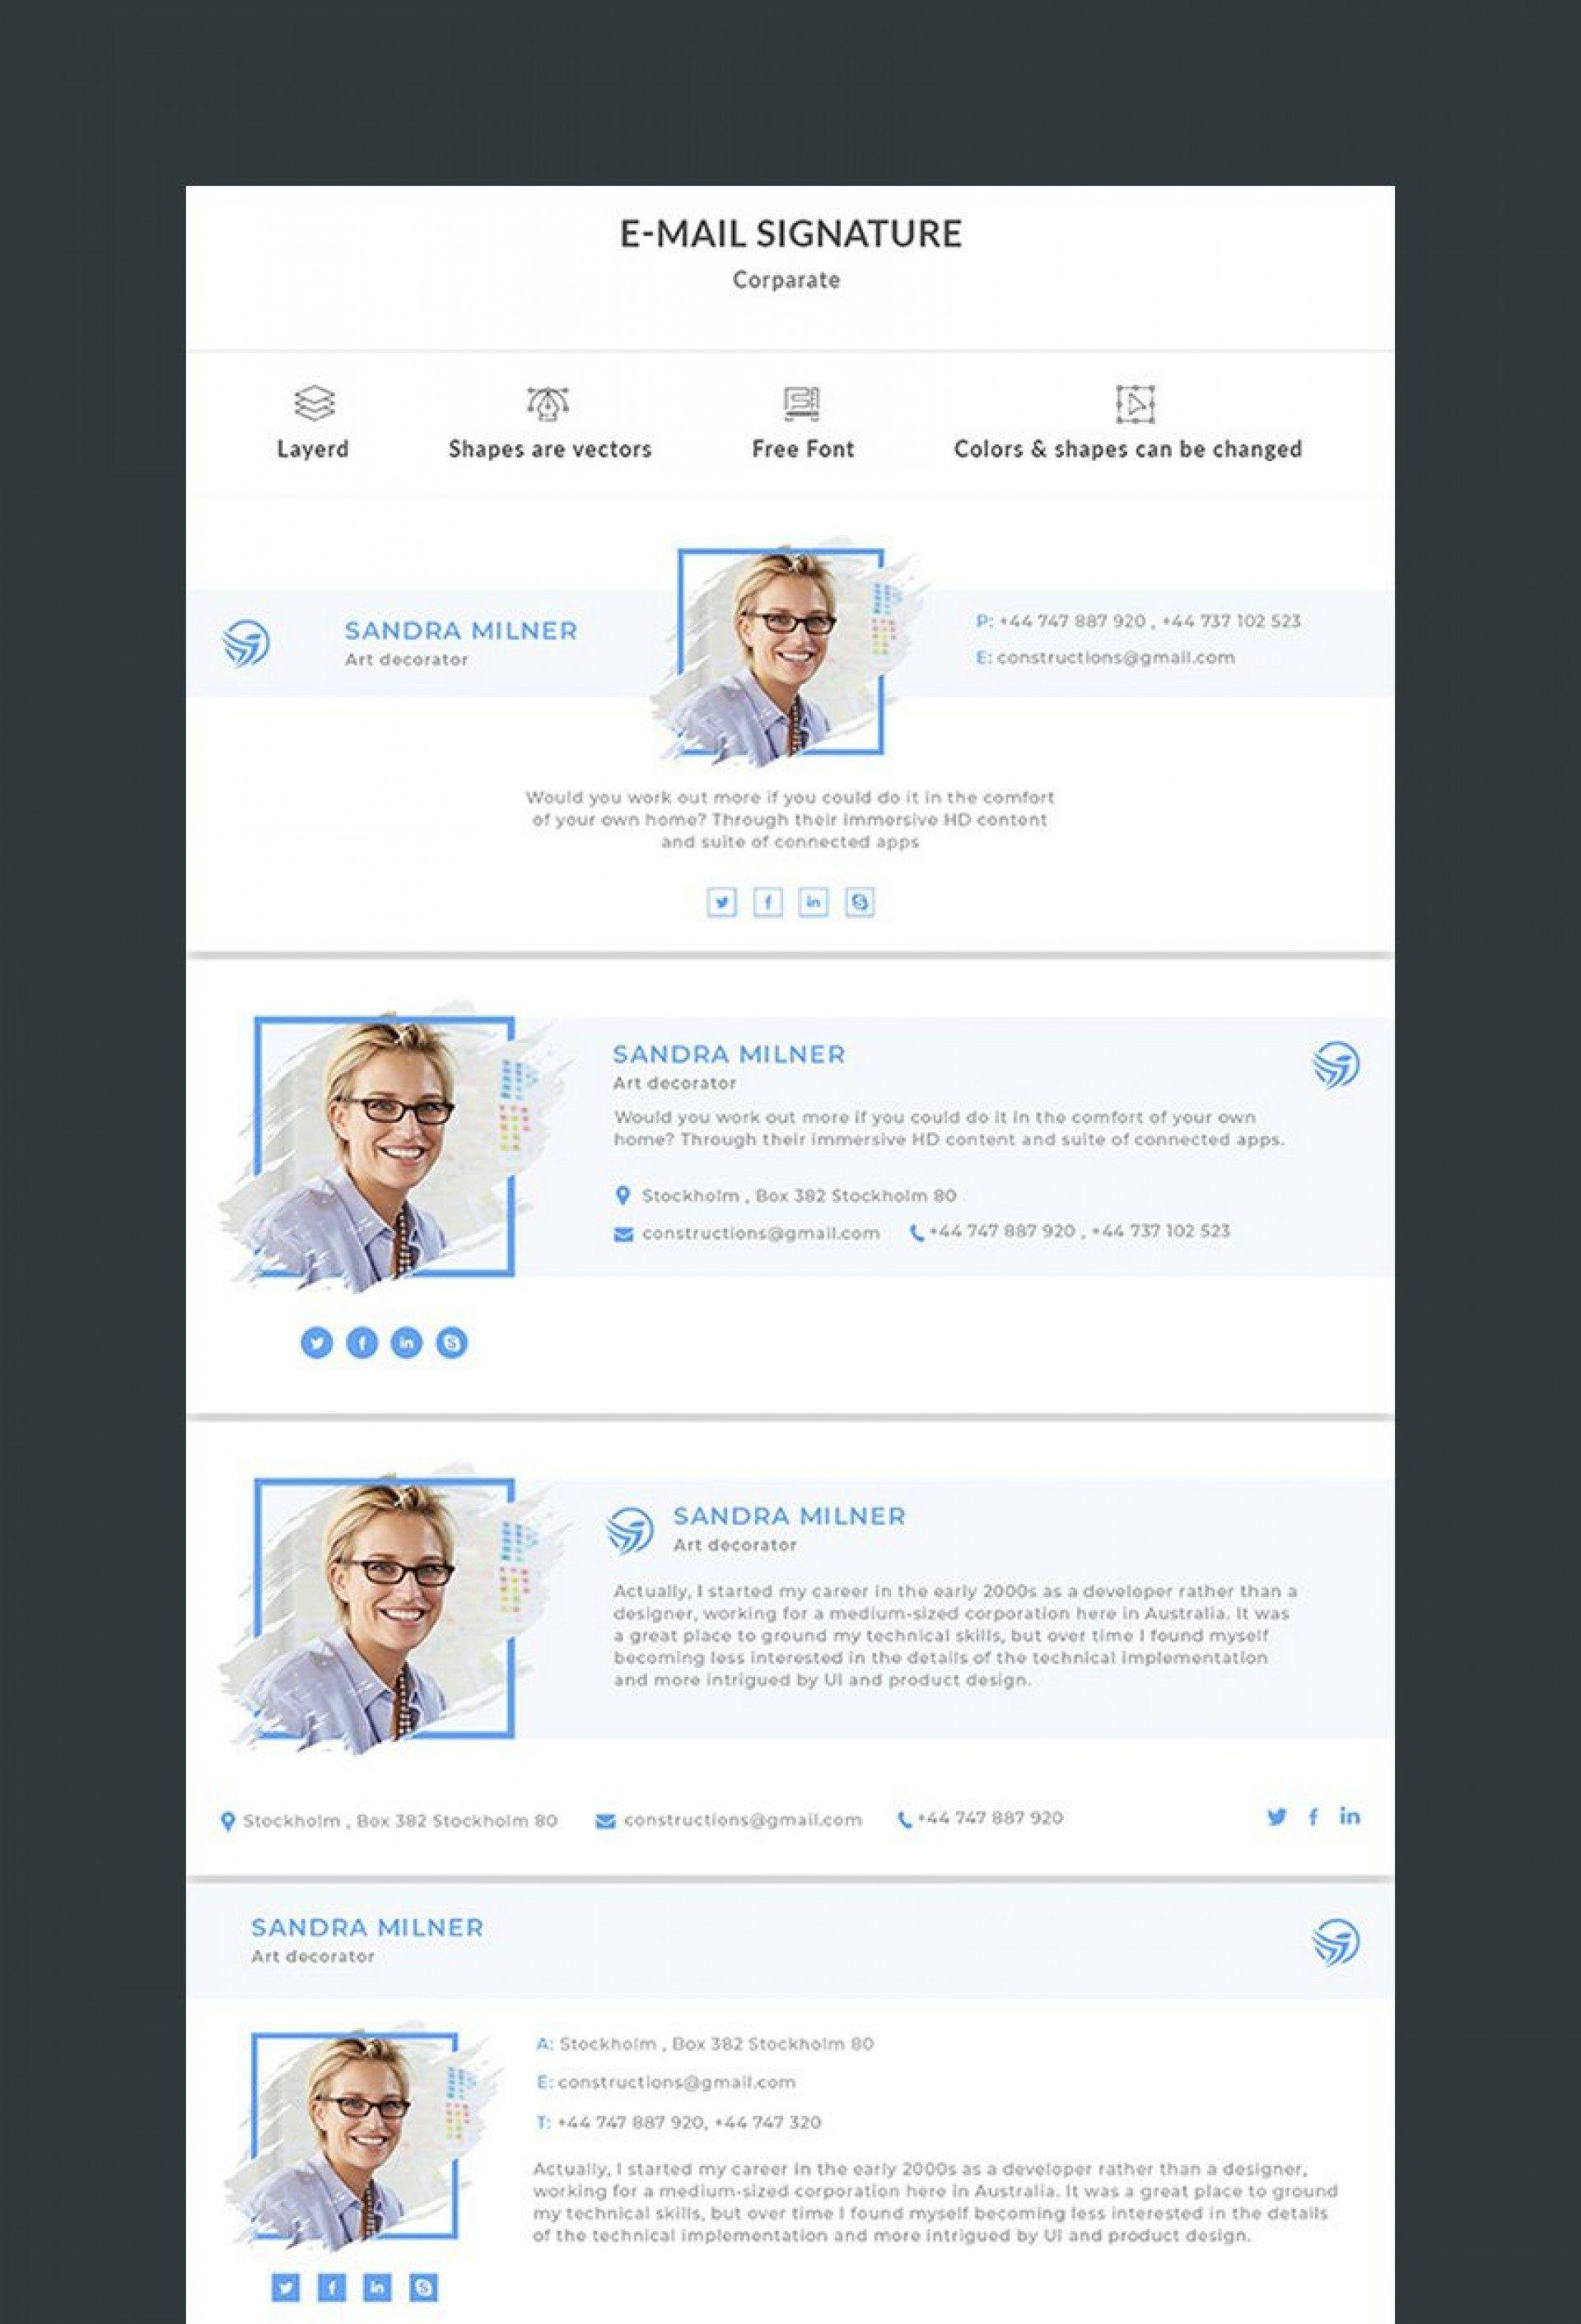 004 Imposing Email Signature Design Outlook Free Highest Clarity Full